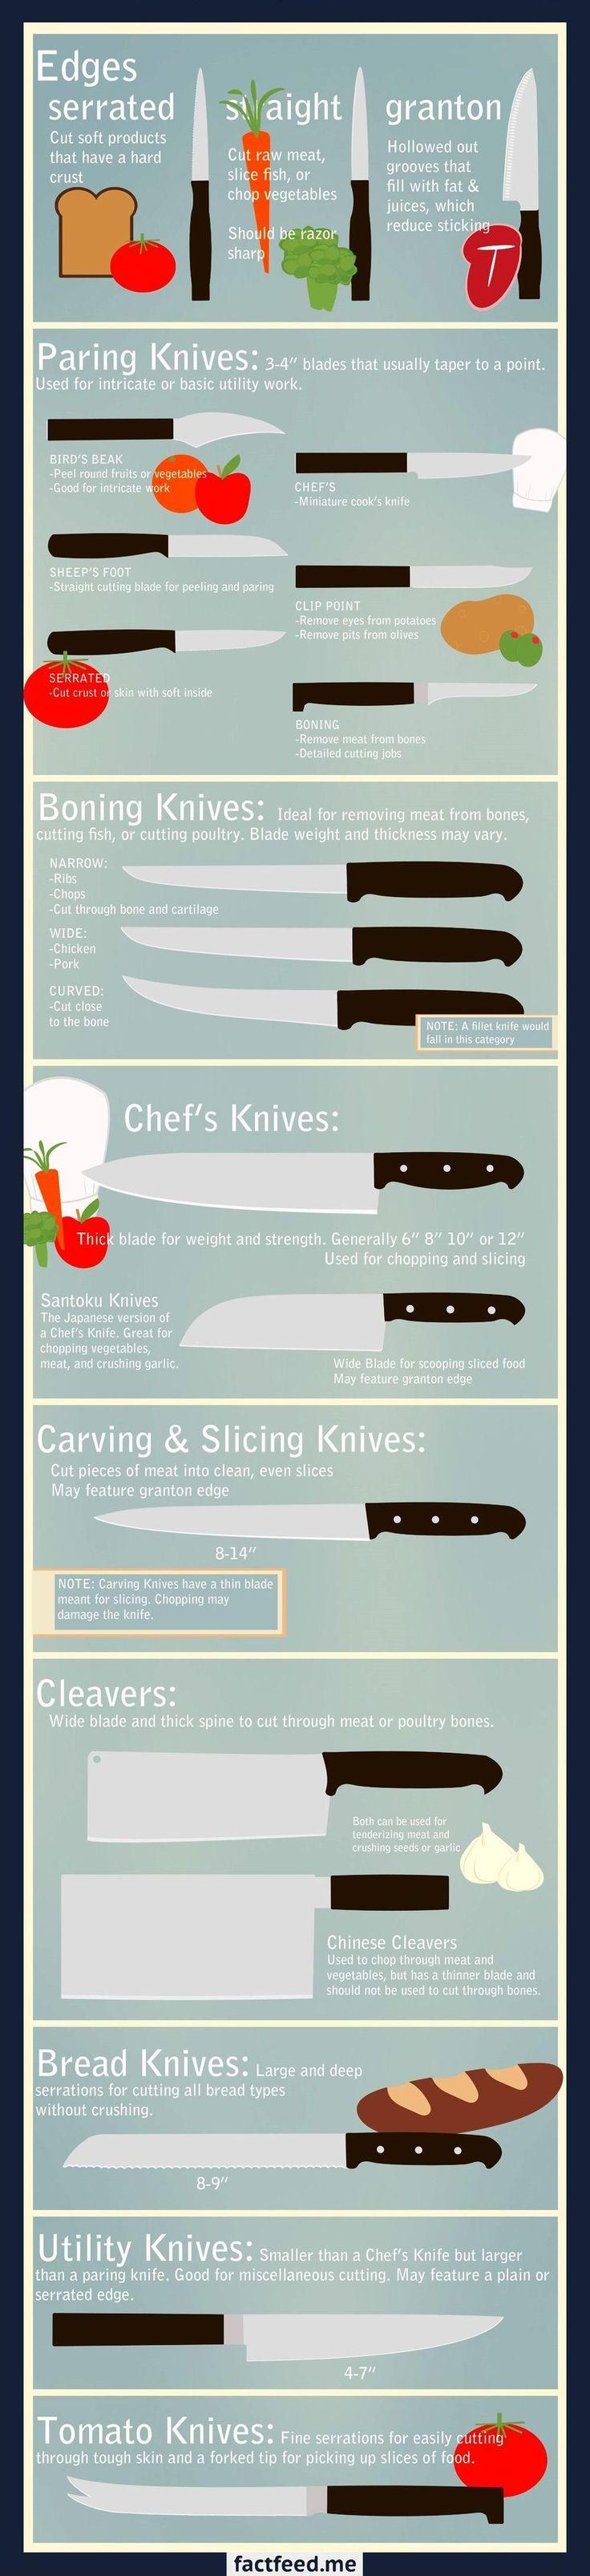 100 kitchen devil knives uk the 25 best kitchen logo ideas kitchen devil knives uk 92 best knives images on pinterest